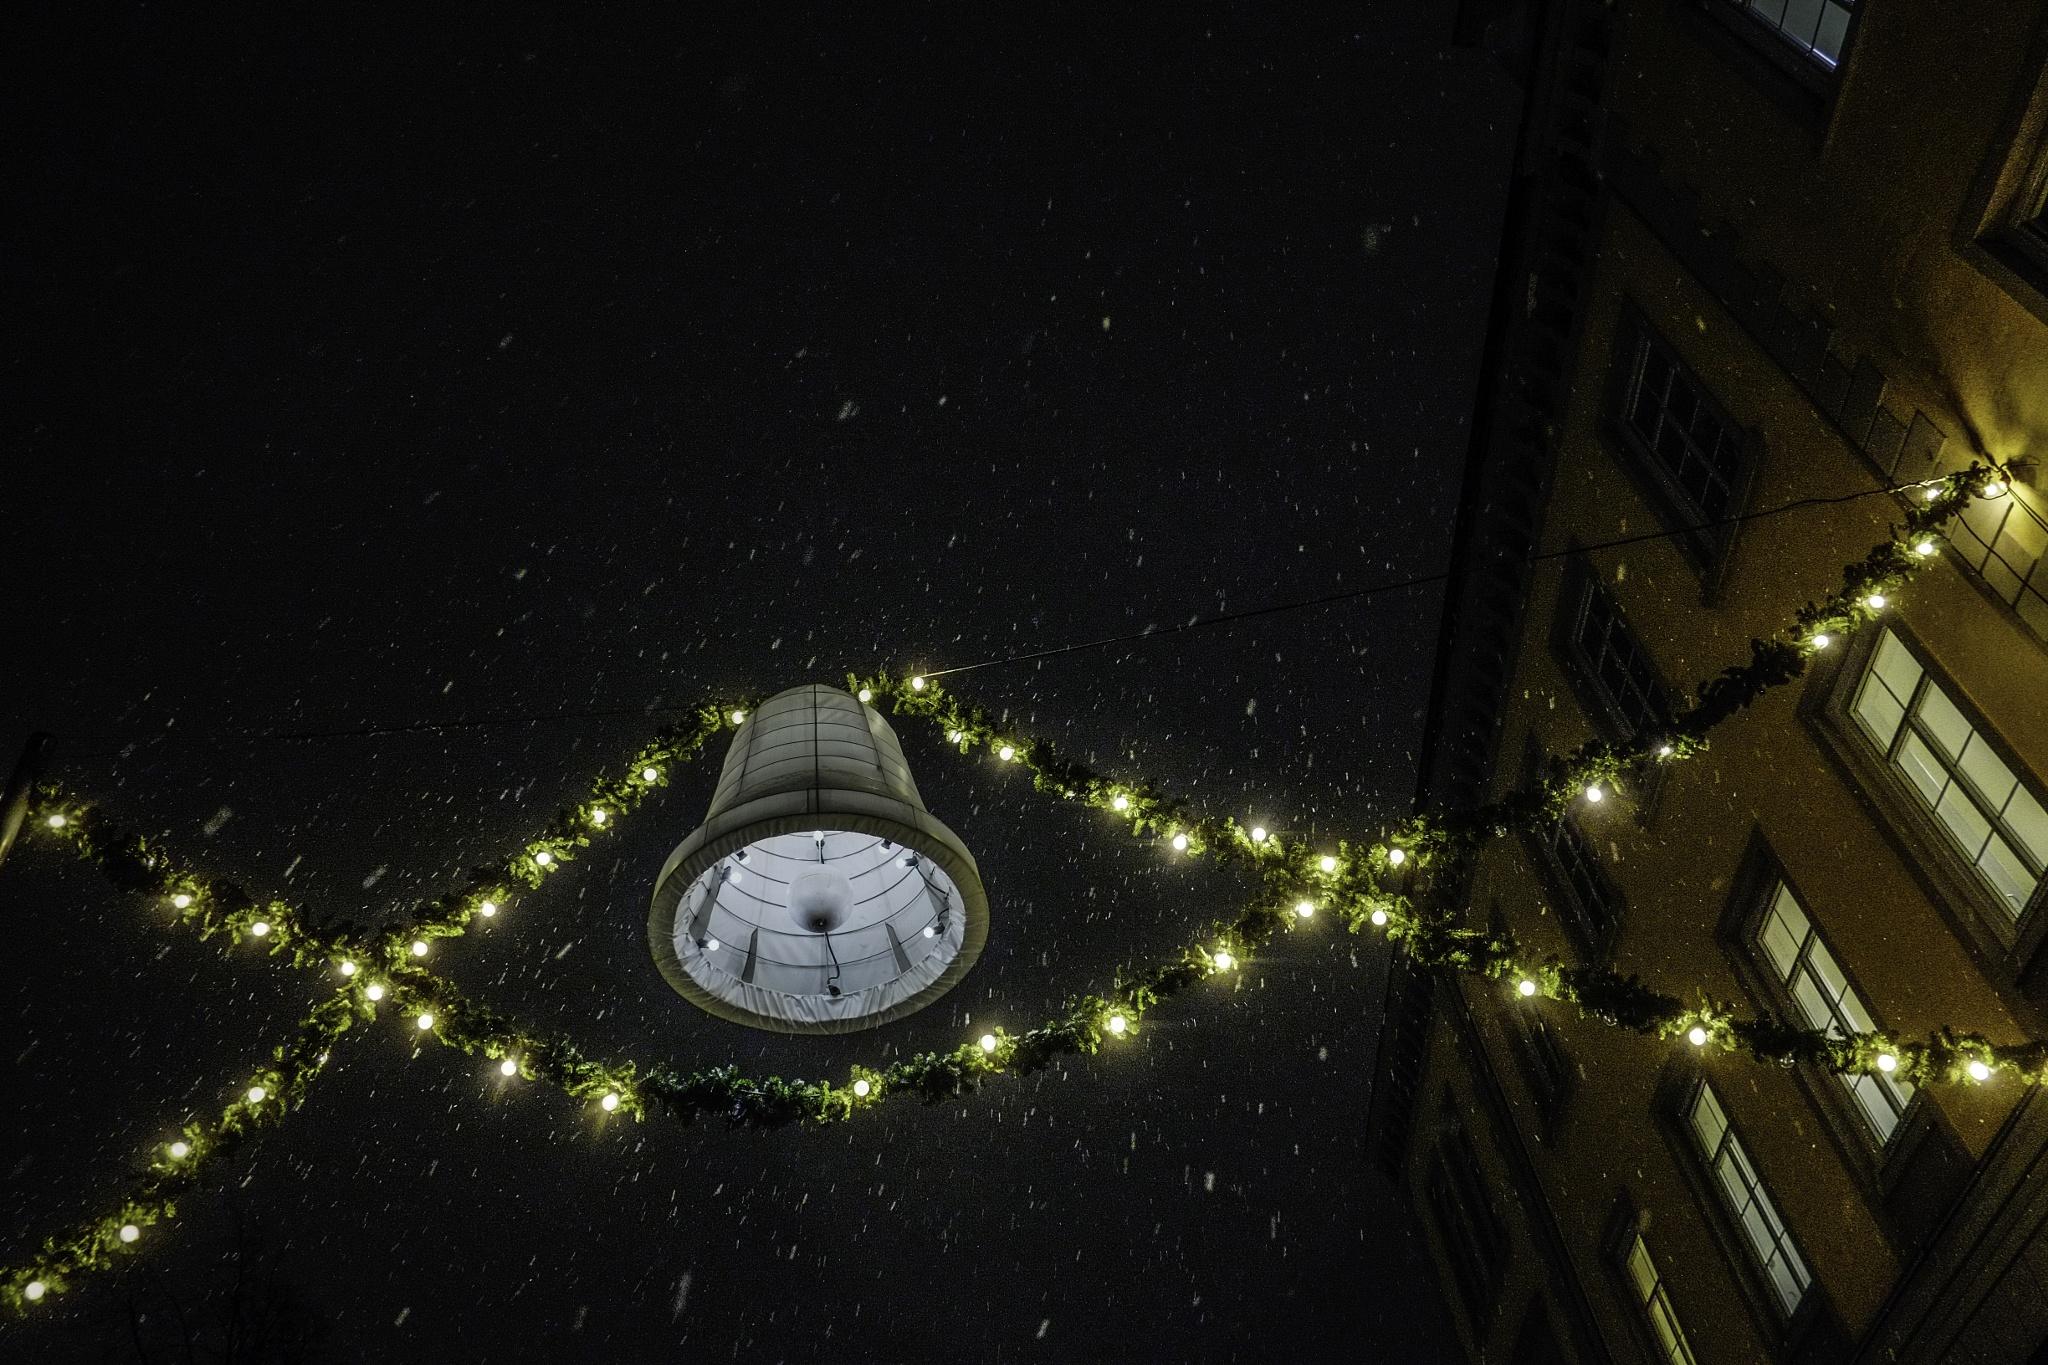 Lantern & Snow by Goran Jorganovich